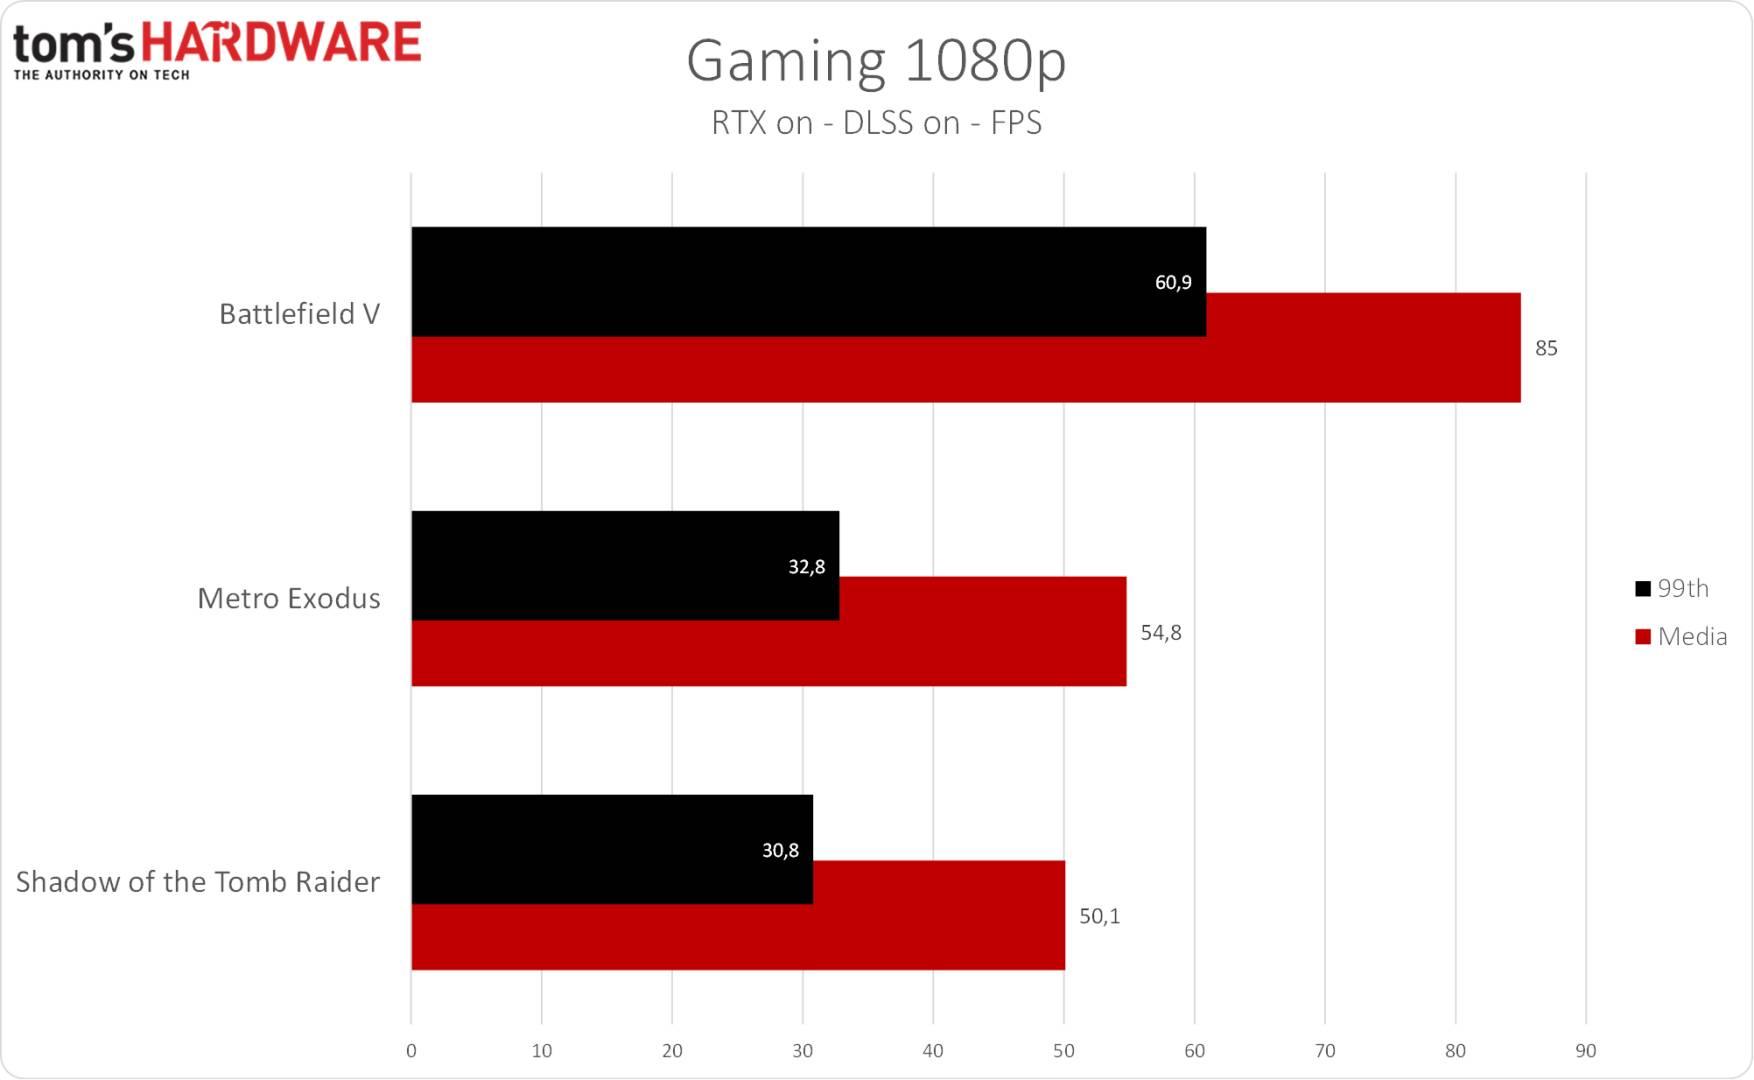 Eurocom Nightsky RX15 - Gaming 1080p RTX DLSS